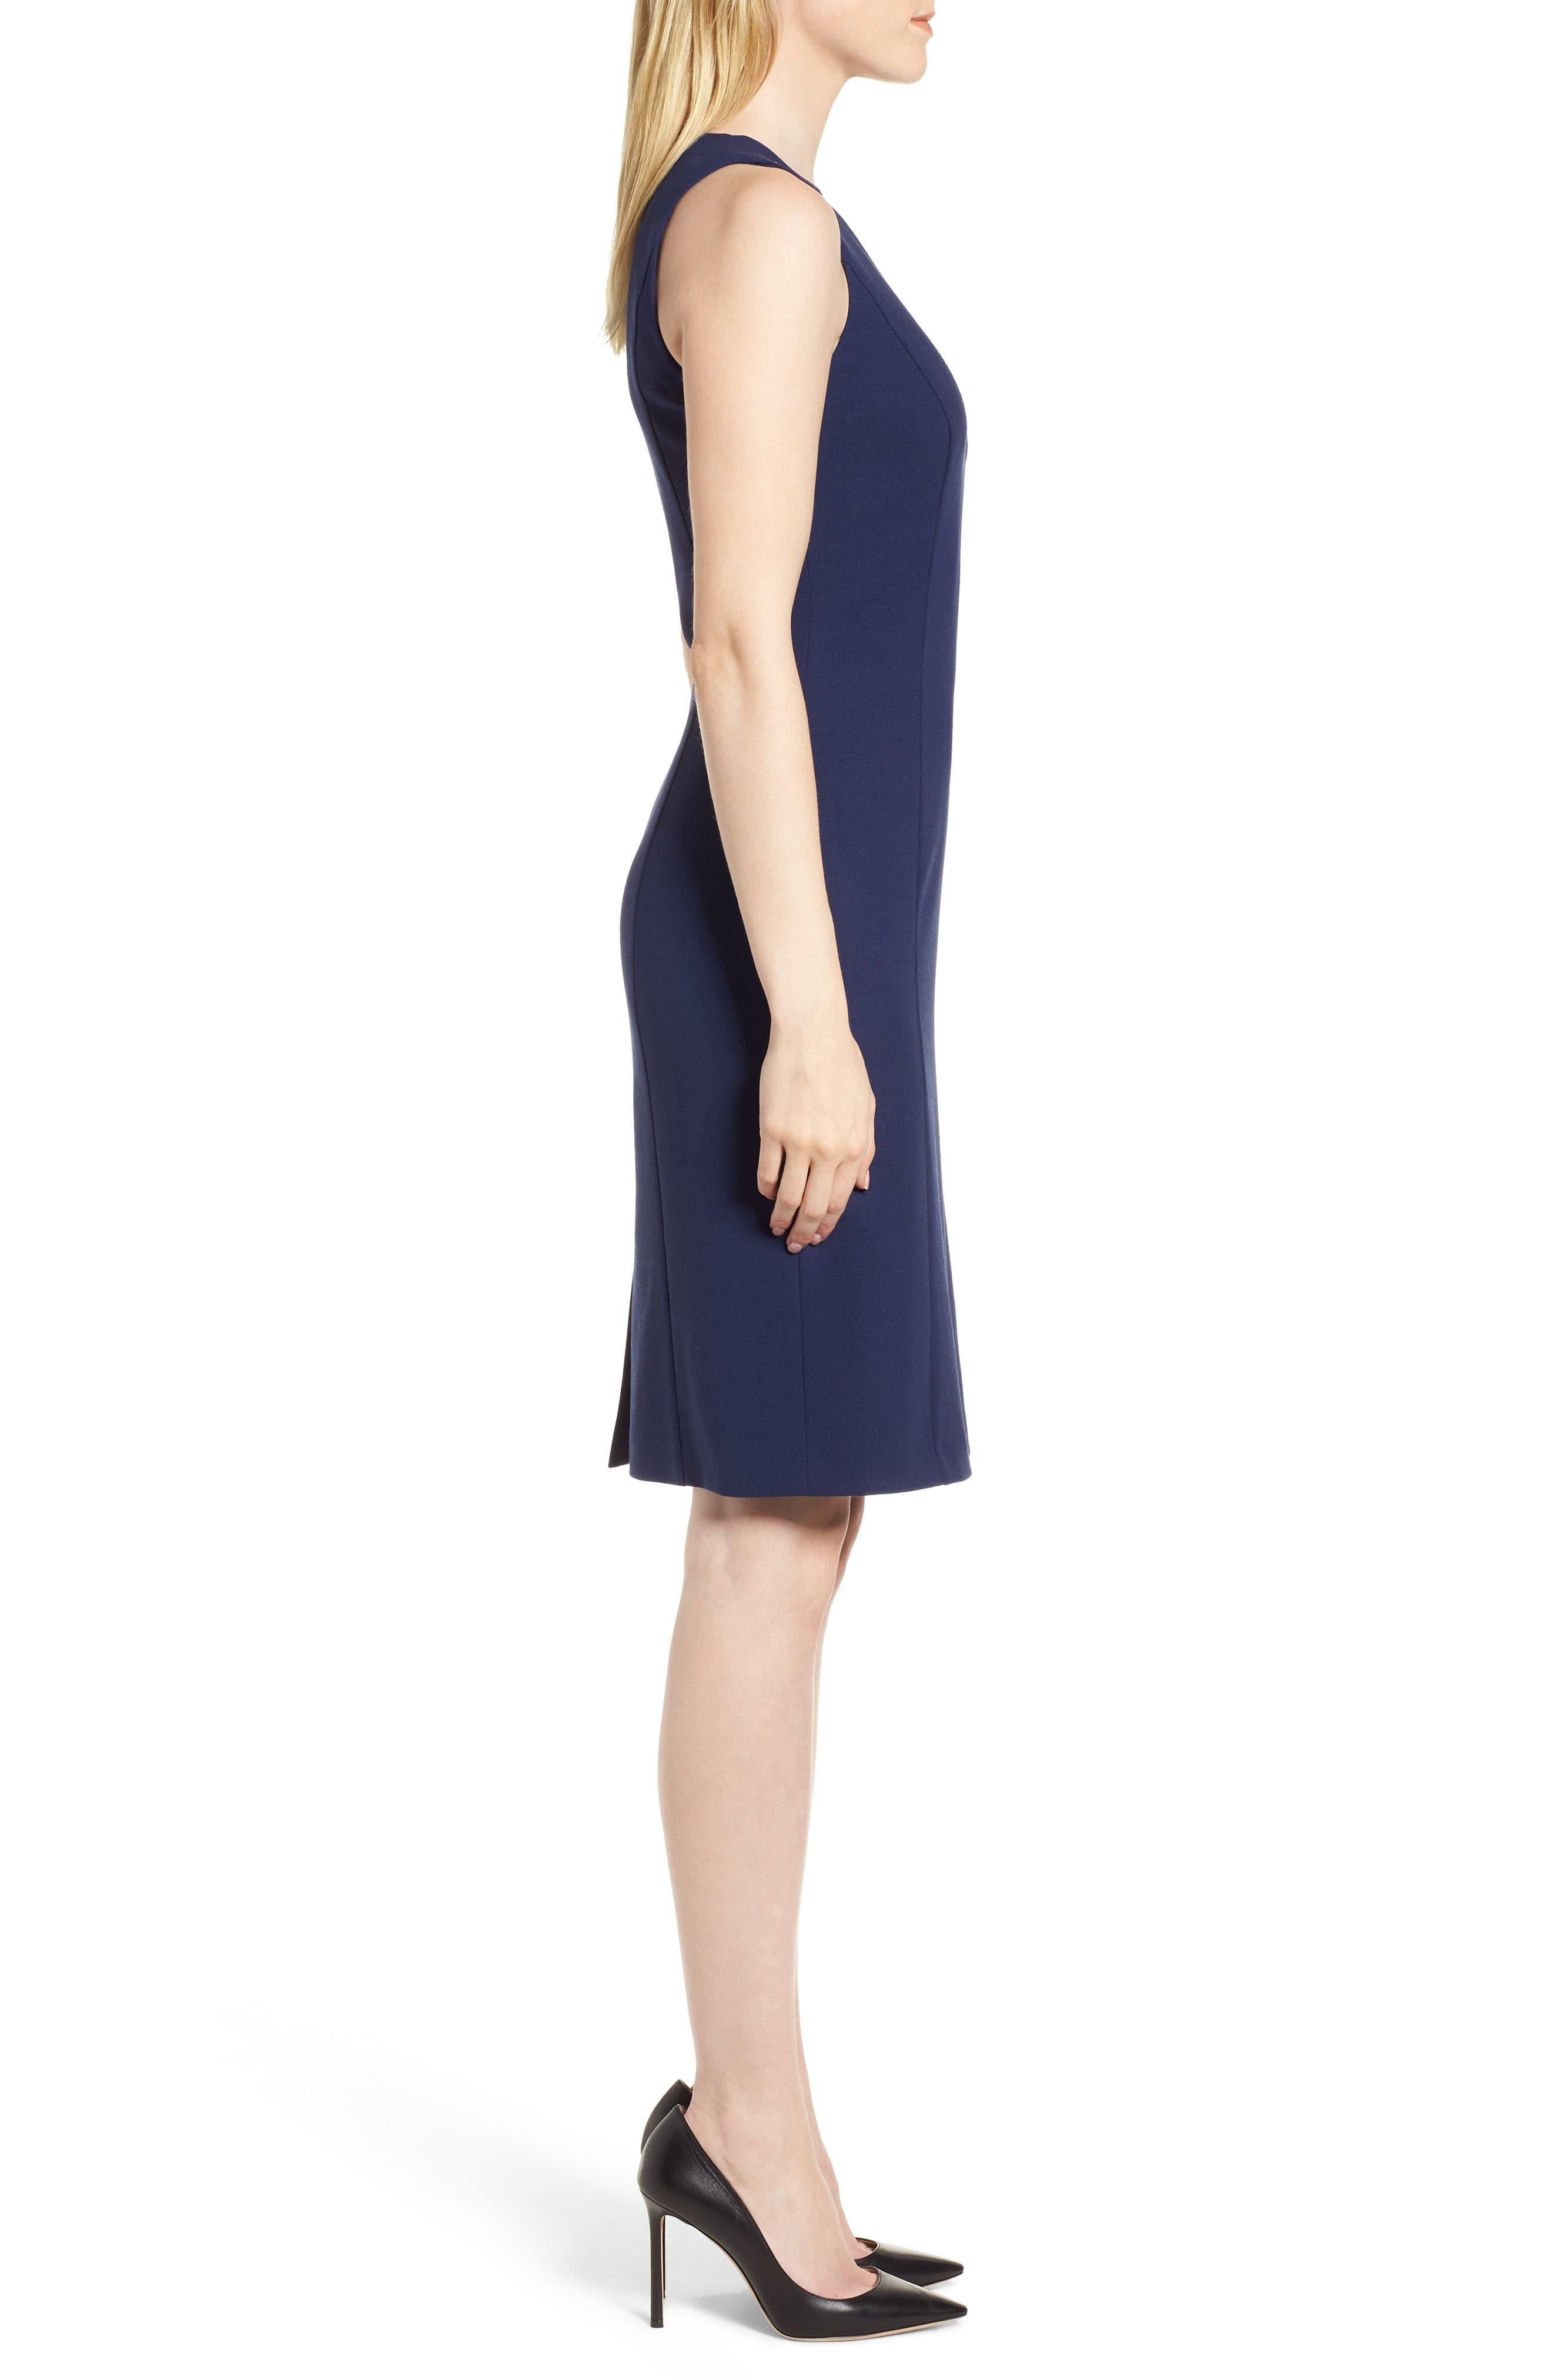 Dibalena Texture Stretch Dress,                             Alternate thumbnail 3, color,                             Nautical